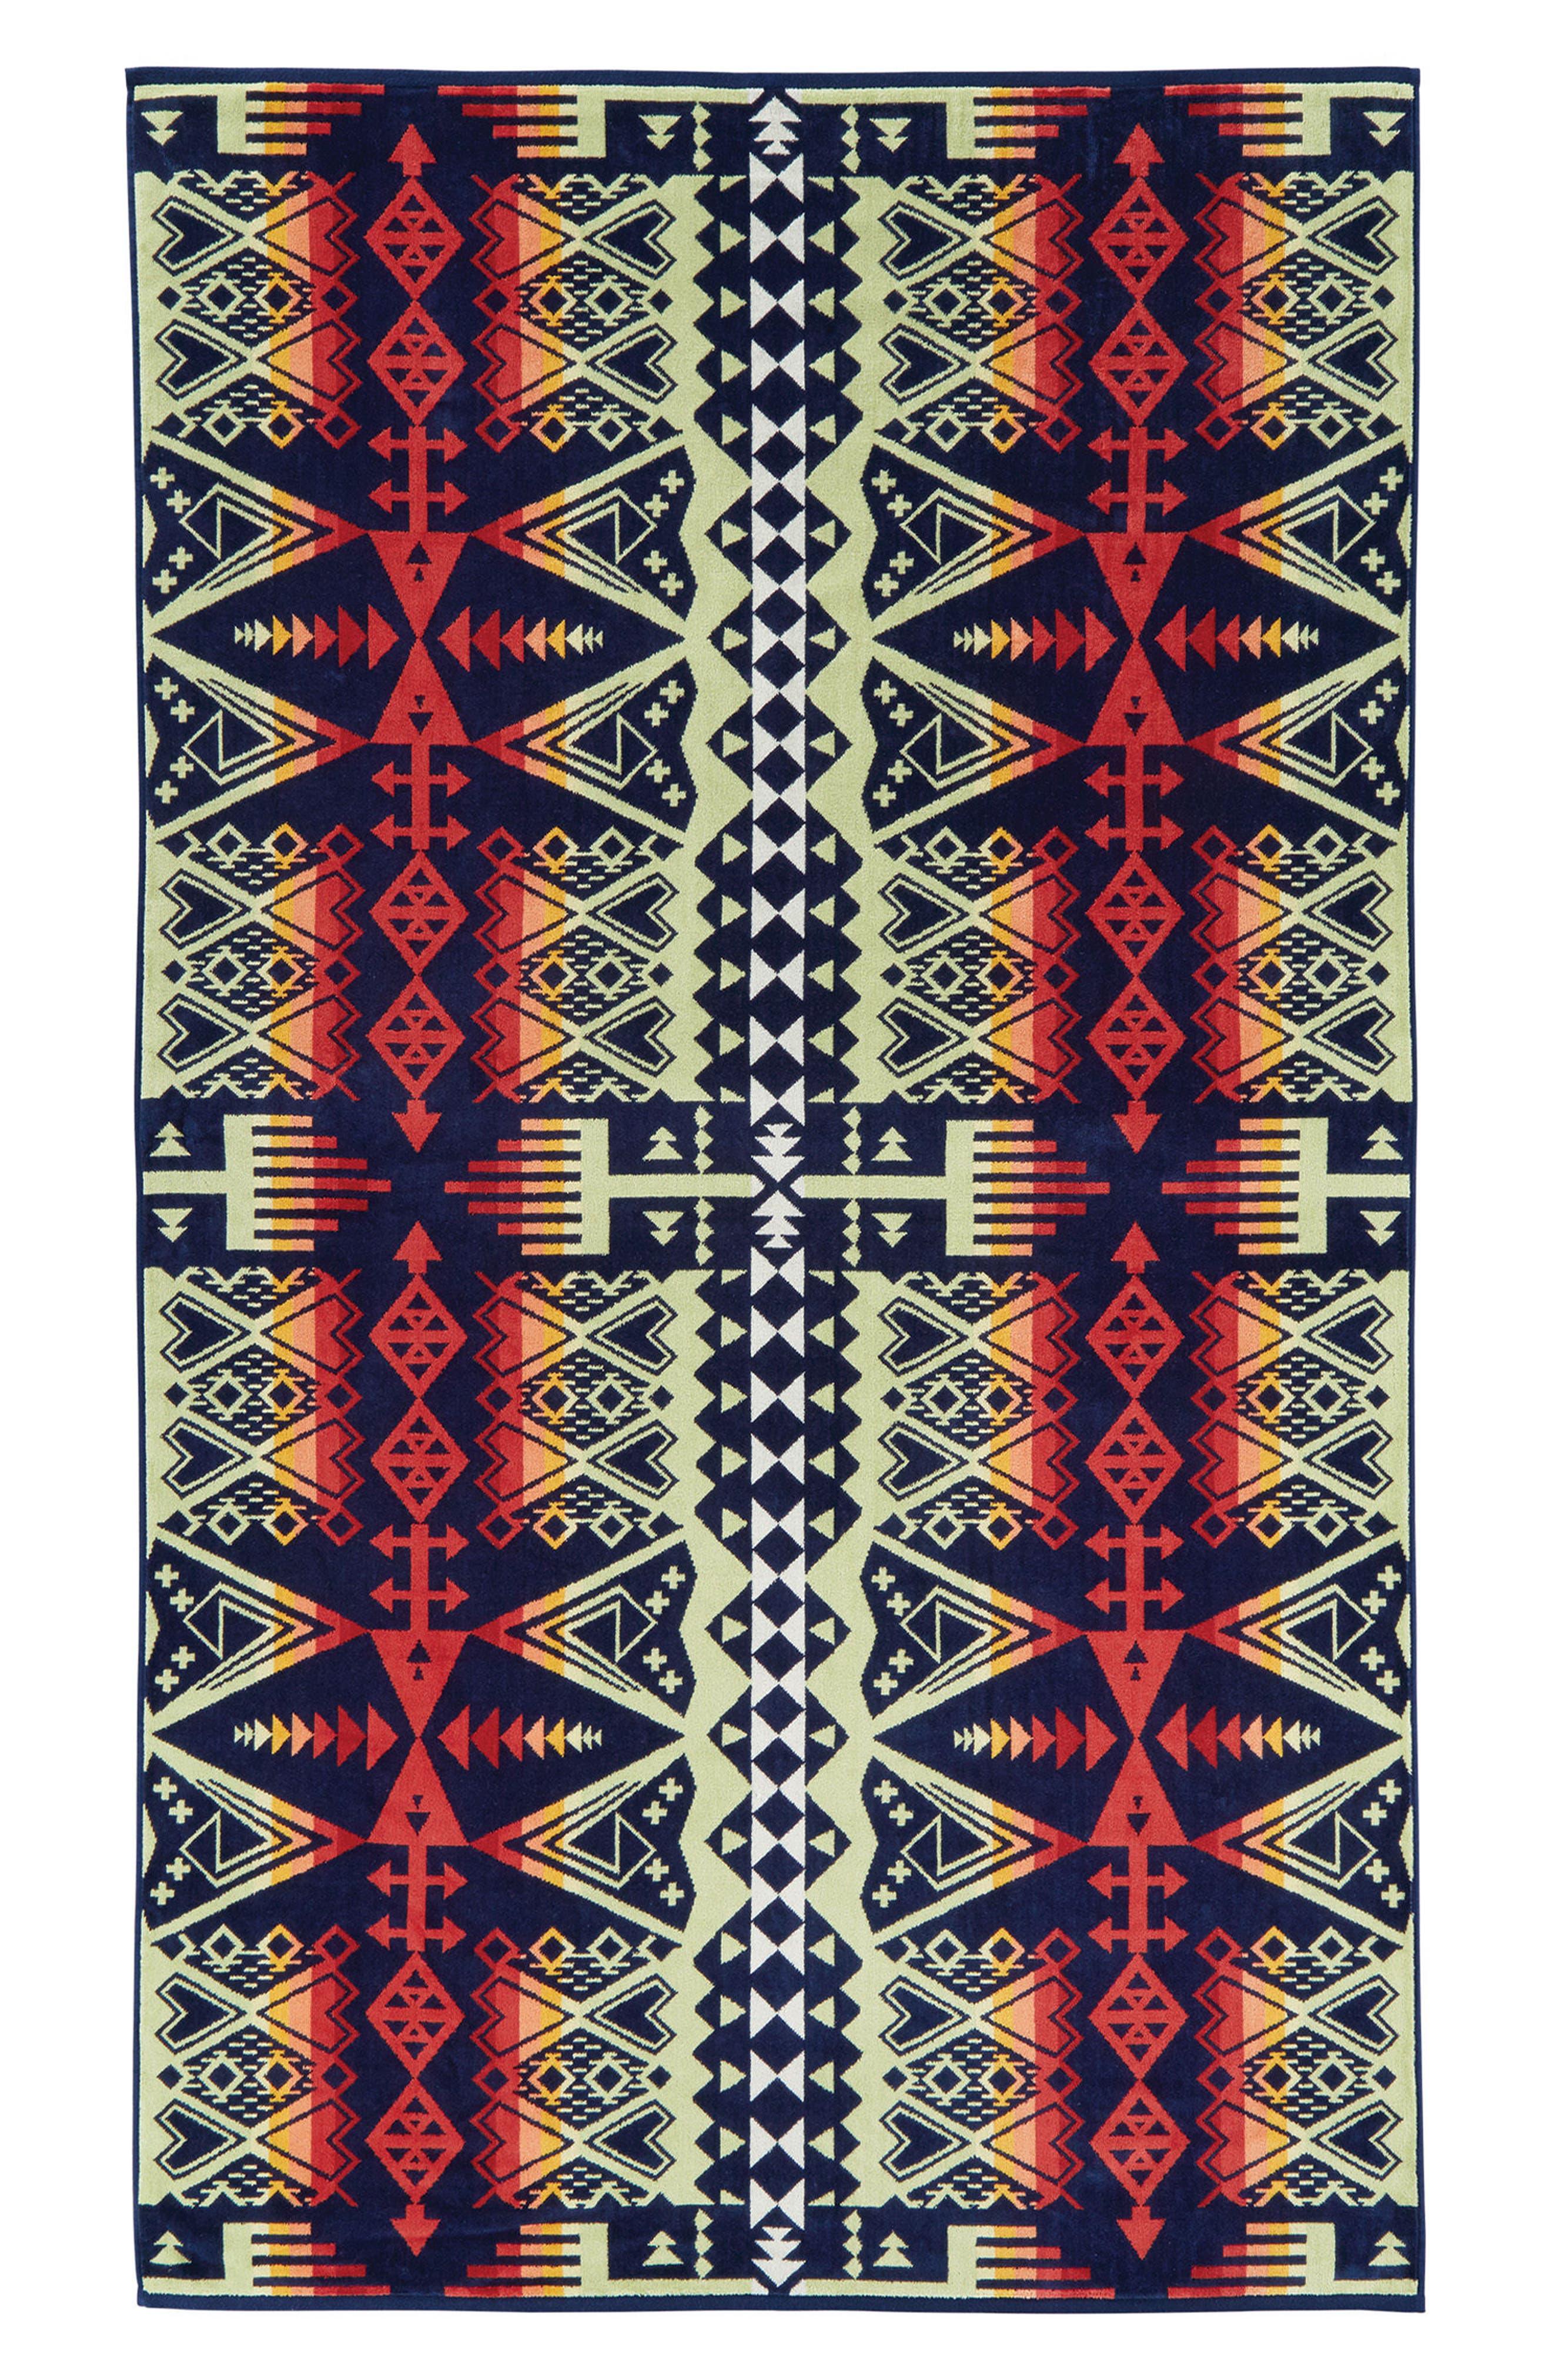 Arrow Revival Jacquard Towel,                         Main,                         color, NAVY